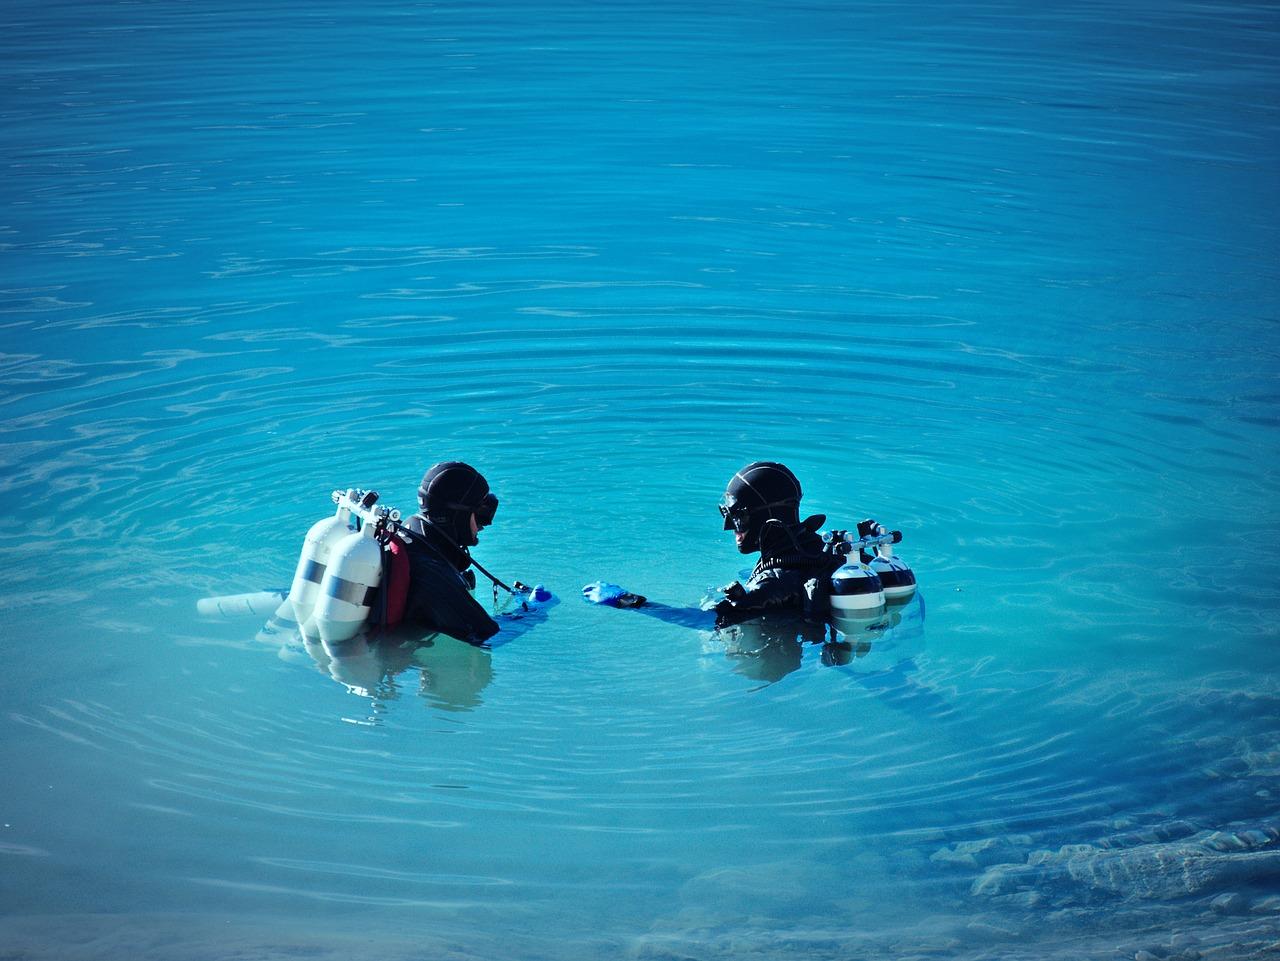 divers-2824866_1280.jpg